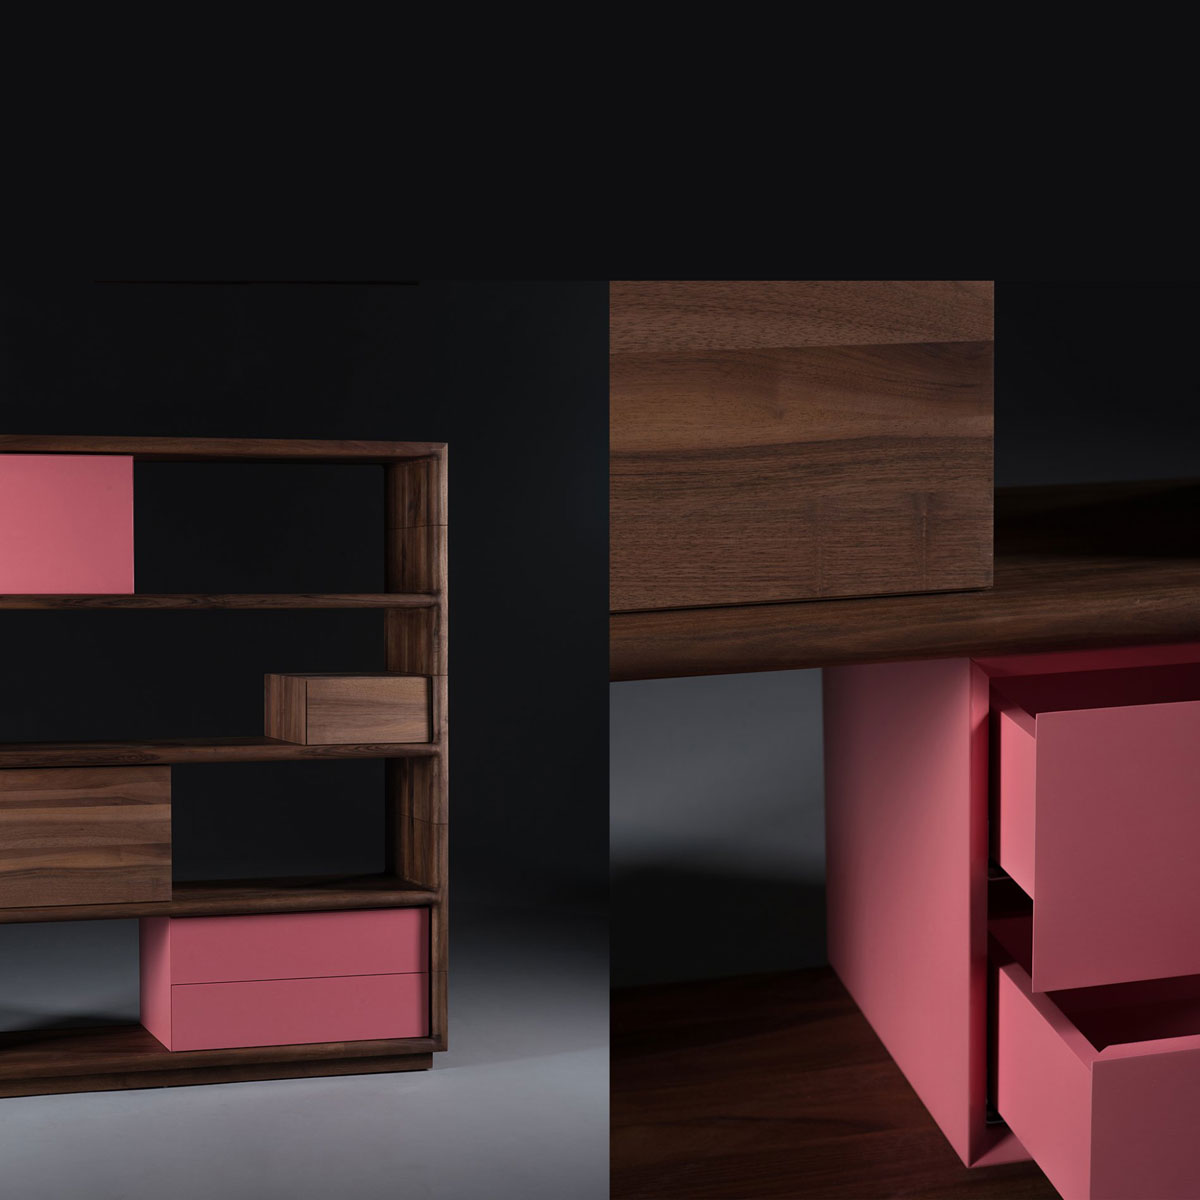 Mueble modular agilis en madera maciza moderno y actual for Mueble modular